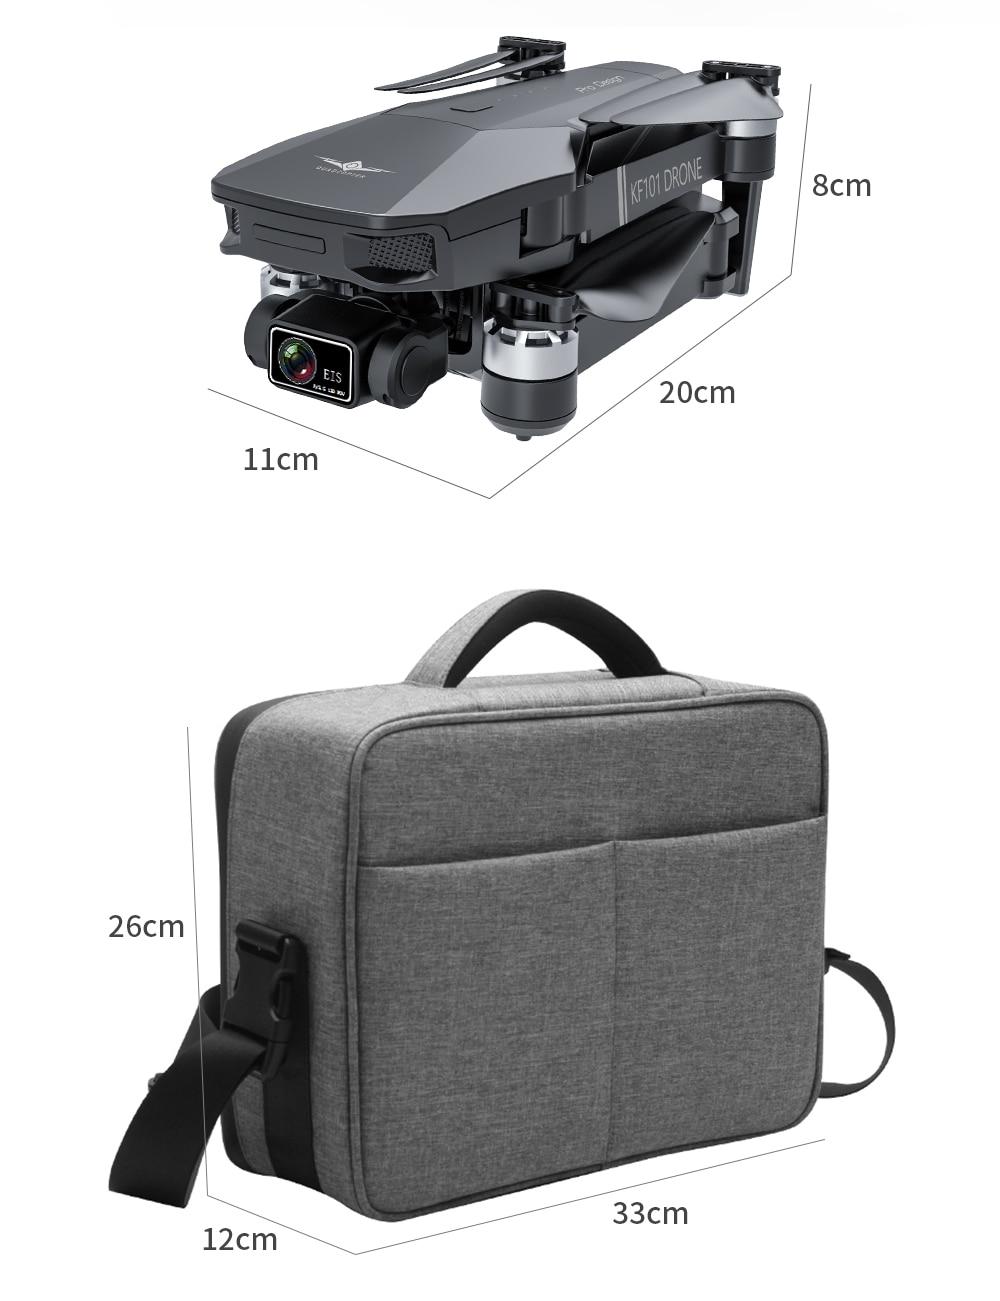 H6a1daa7309084576bf64b6cd190d87b6x - New KF101 GPS Drone 4K Professional 8K HD EIS Camera Anti-Shake 3-Axis Gimbal 5G Wifi Brushless Motor RC Foldable Quadcopter